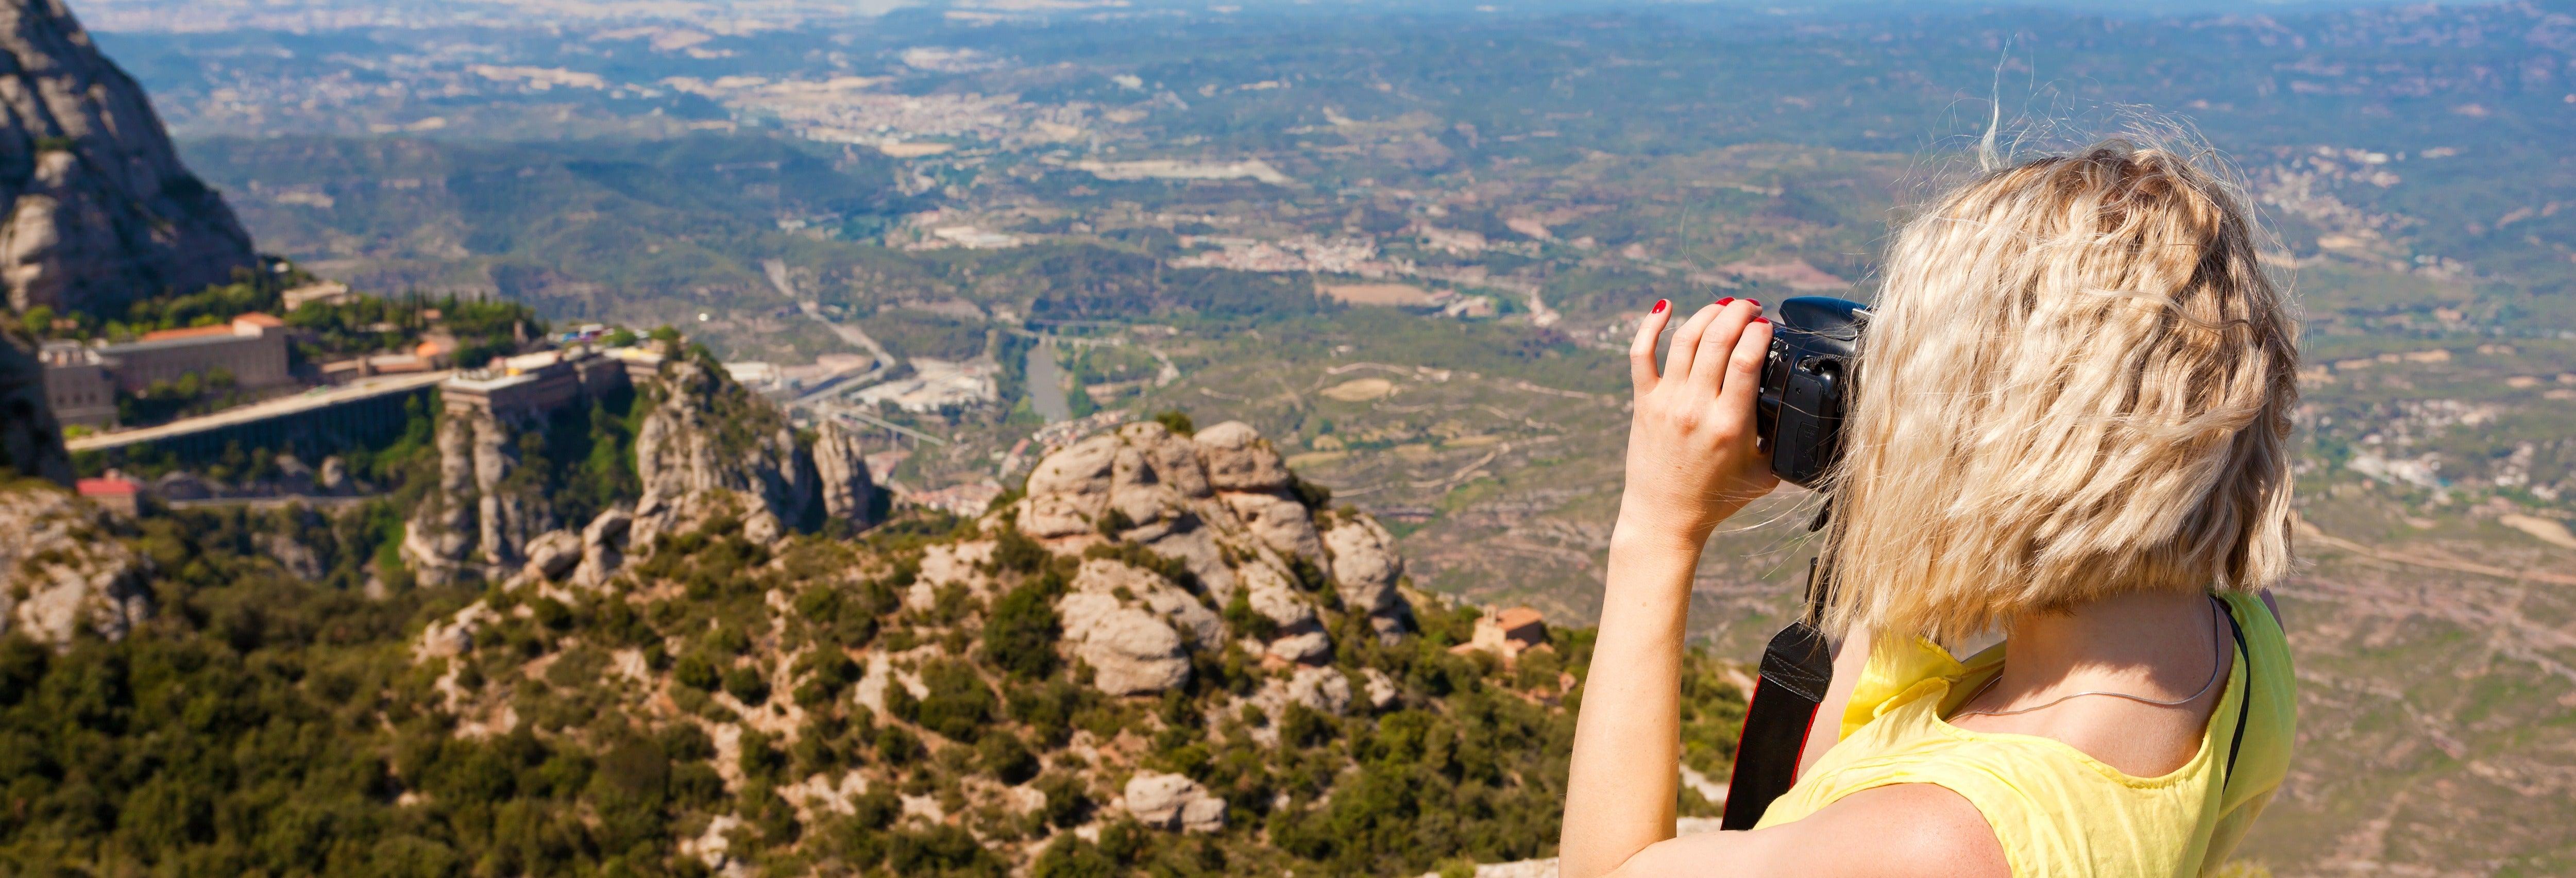 Montserrat & Sagrada Família Combo Tour